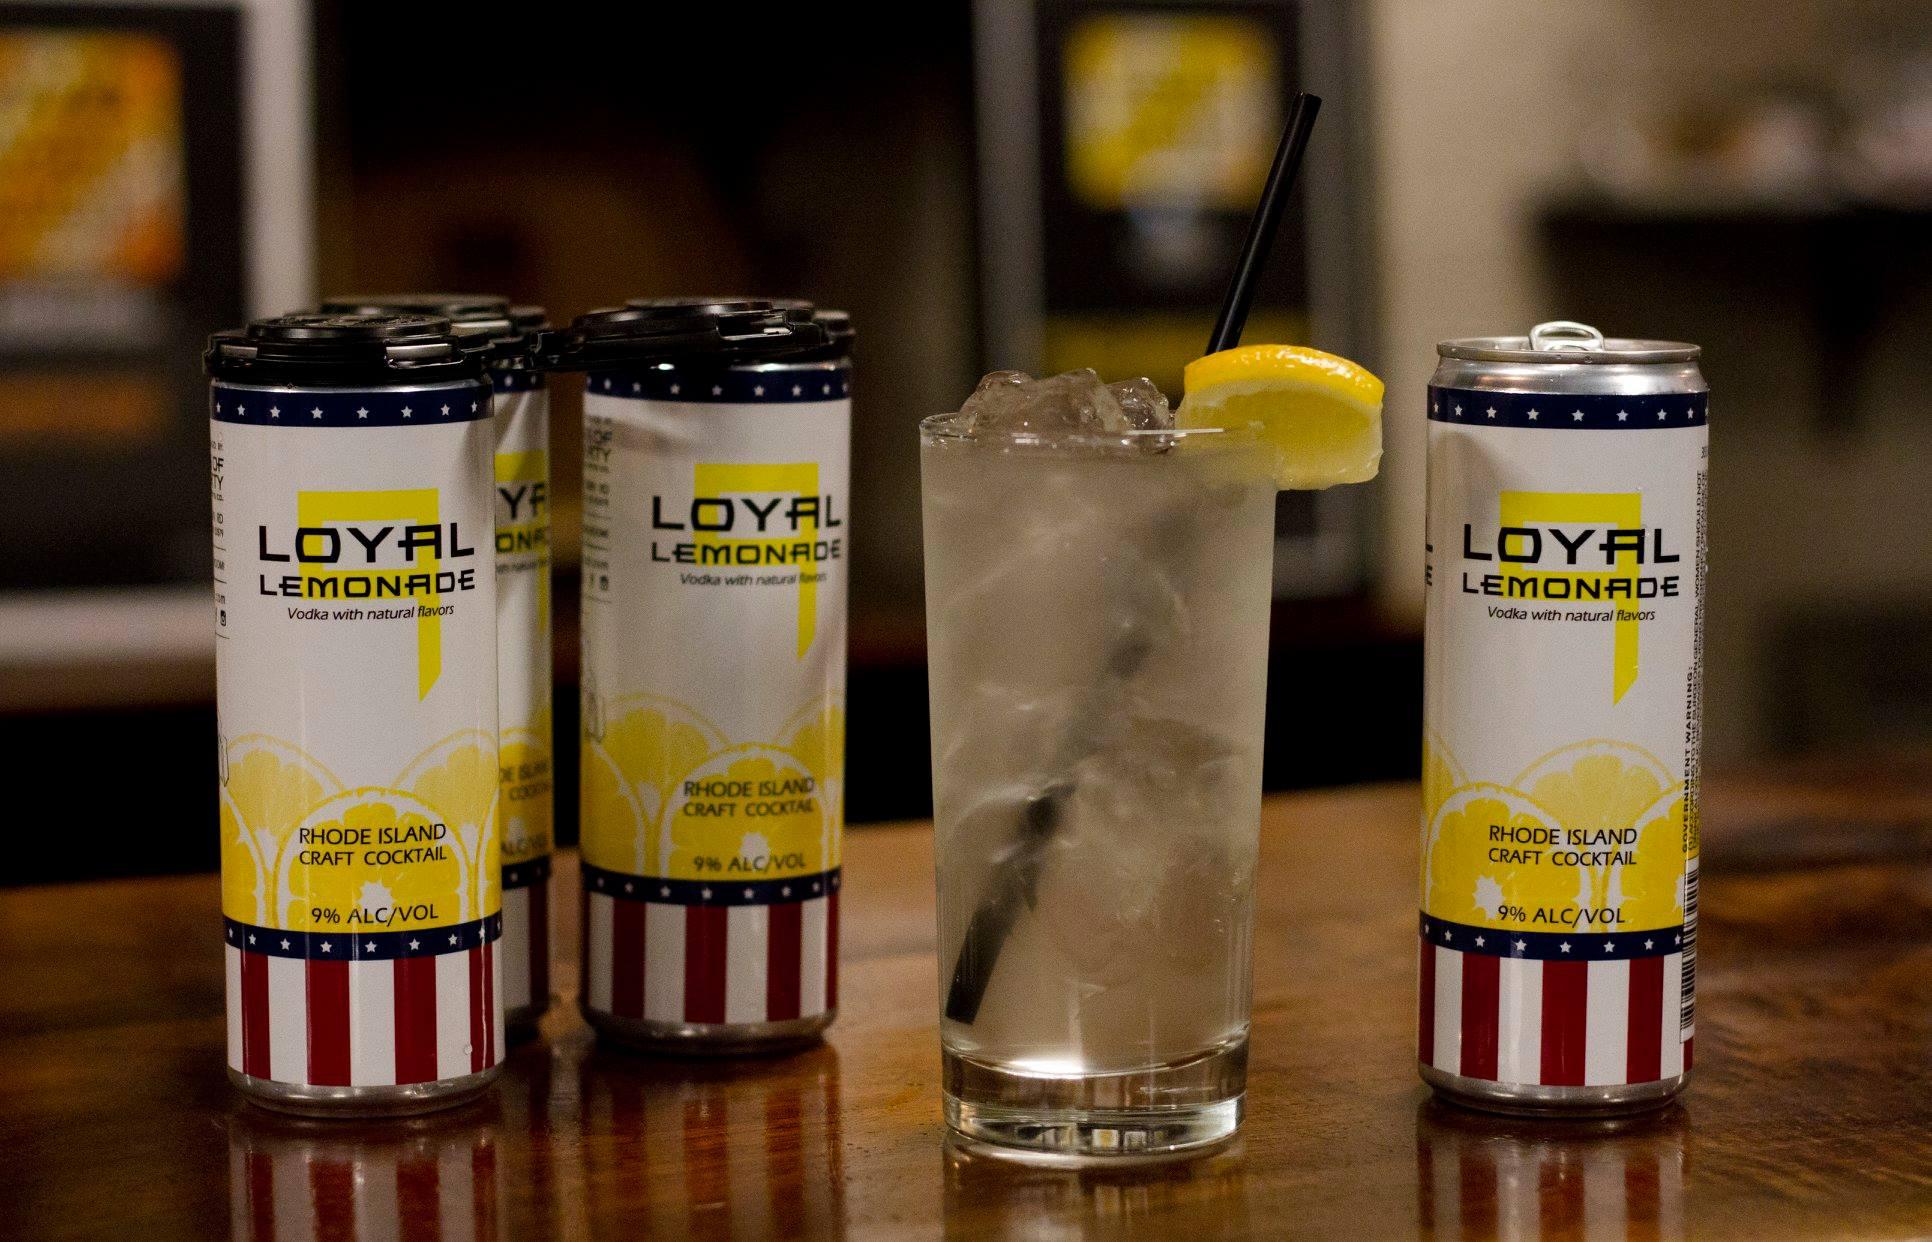 Sons of Liberty Beer & Spirits Co. Loyal Lemonade